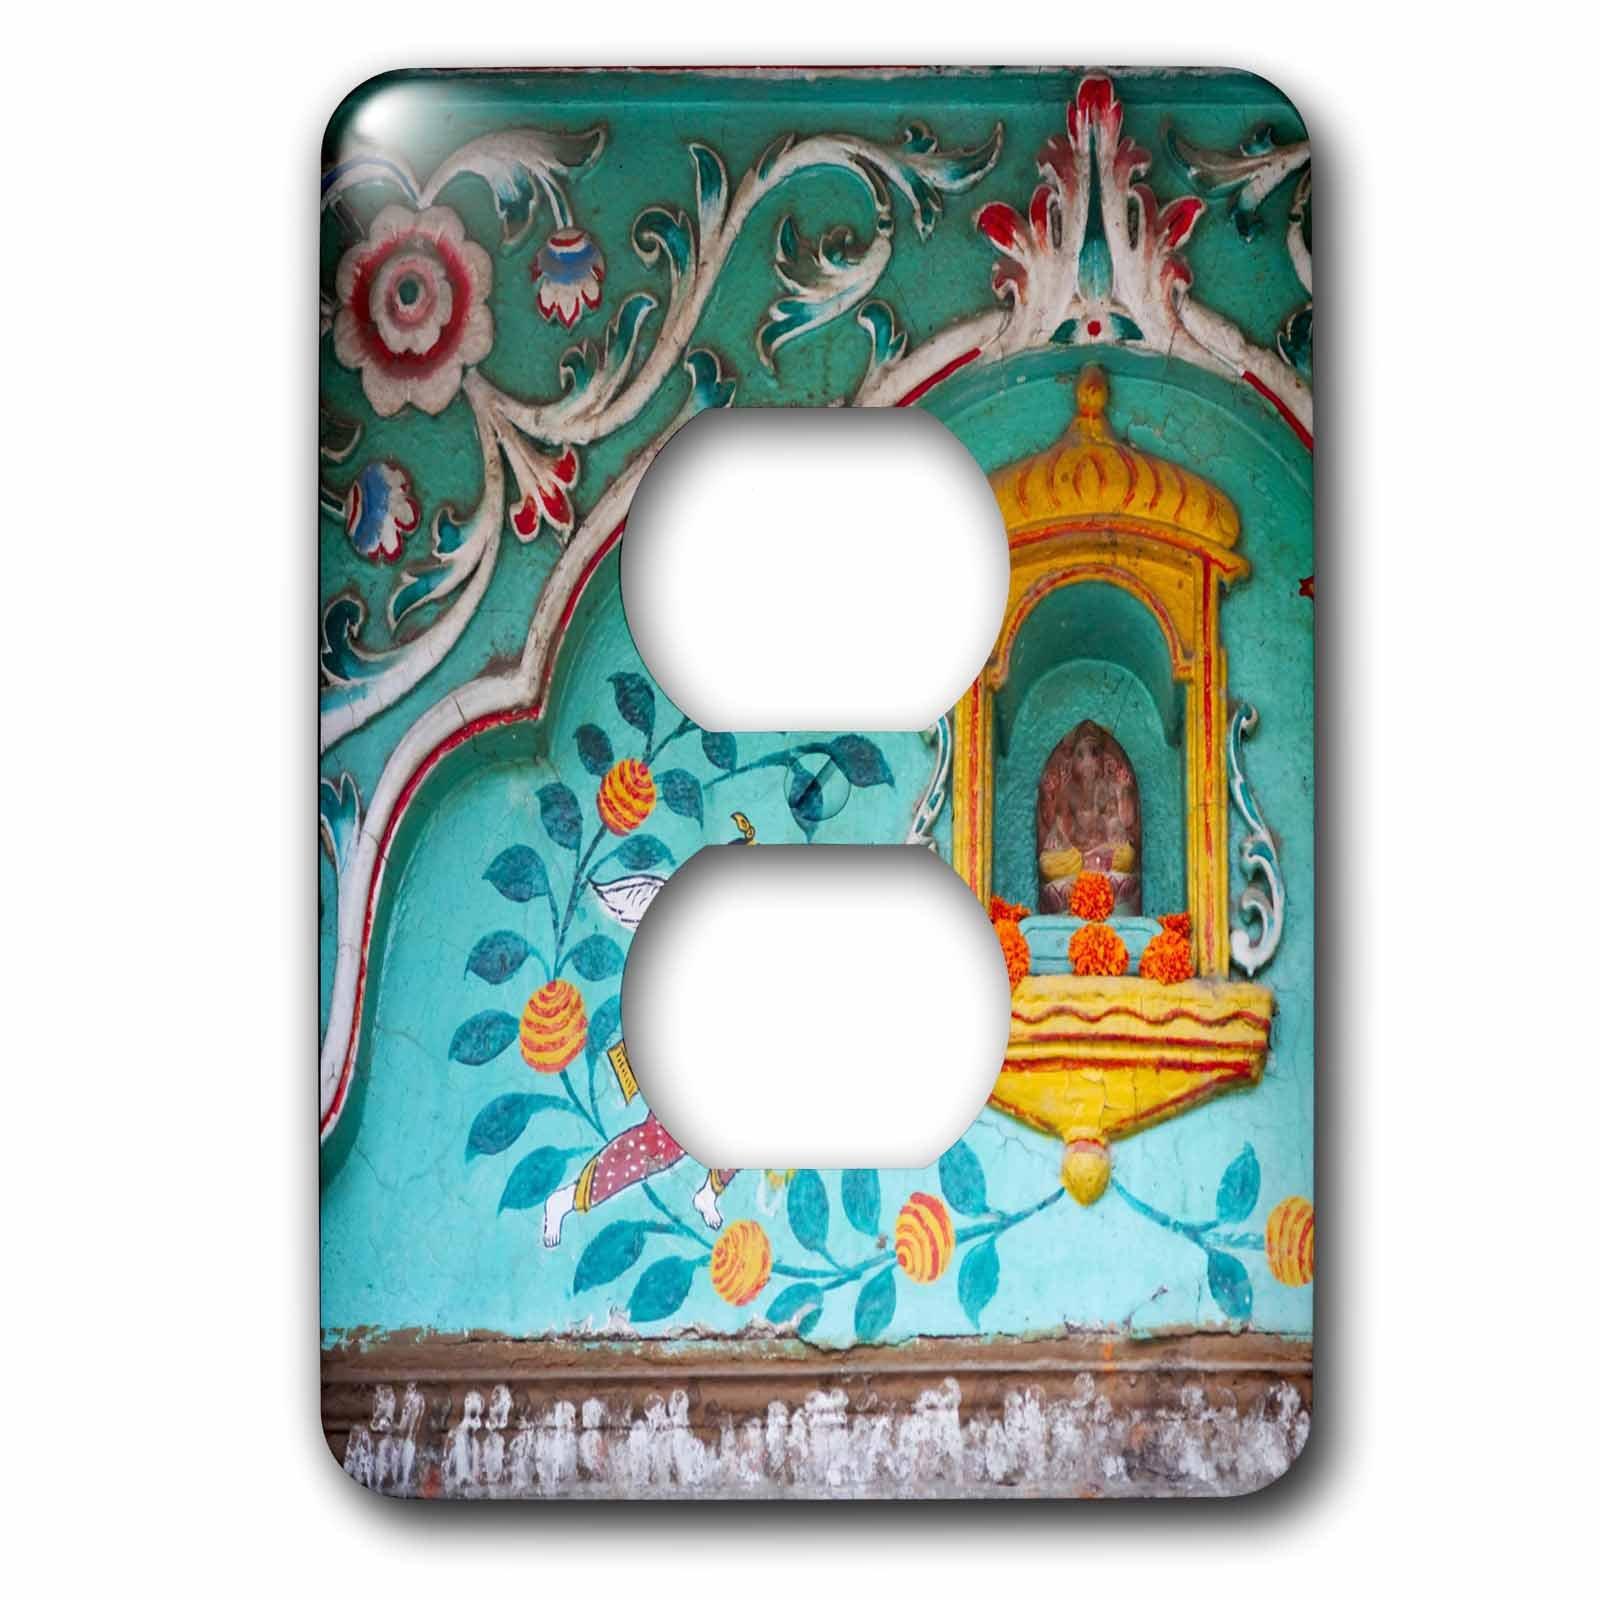 3dRose LLC lsp_132652_6 Architectural Details, Varanasi, India - As10 Ksu0466 - Keren Su 2 Plug Outlet Cover